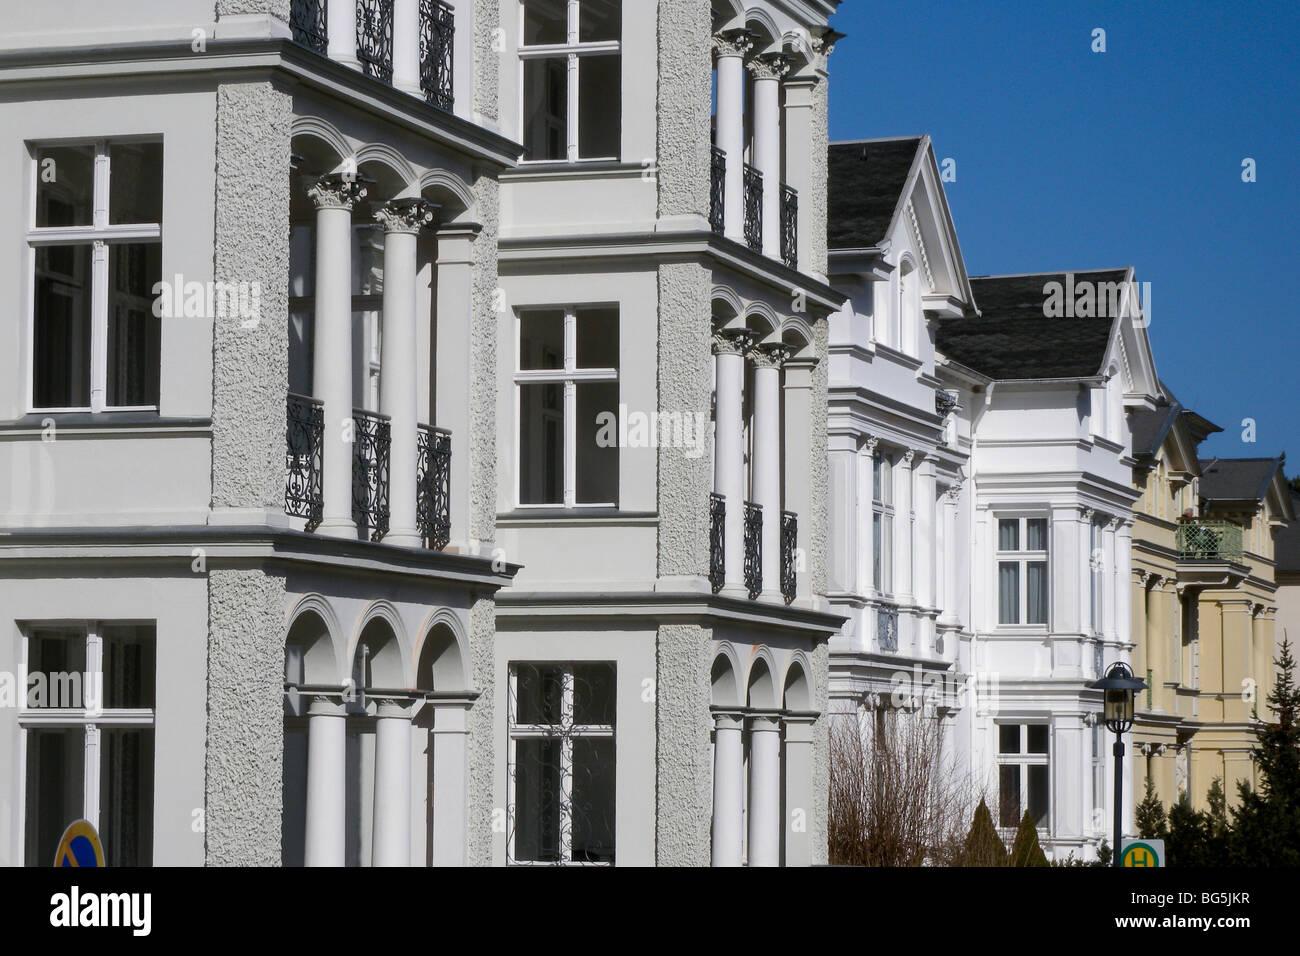 Bäderarchitektur, Heringsdorf, Insel Usedom, Mecklenburg-Vorpommern, Deutschland | Heringsdorf, Isle of Usedom, - Stock Image